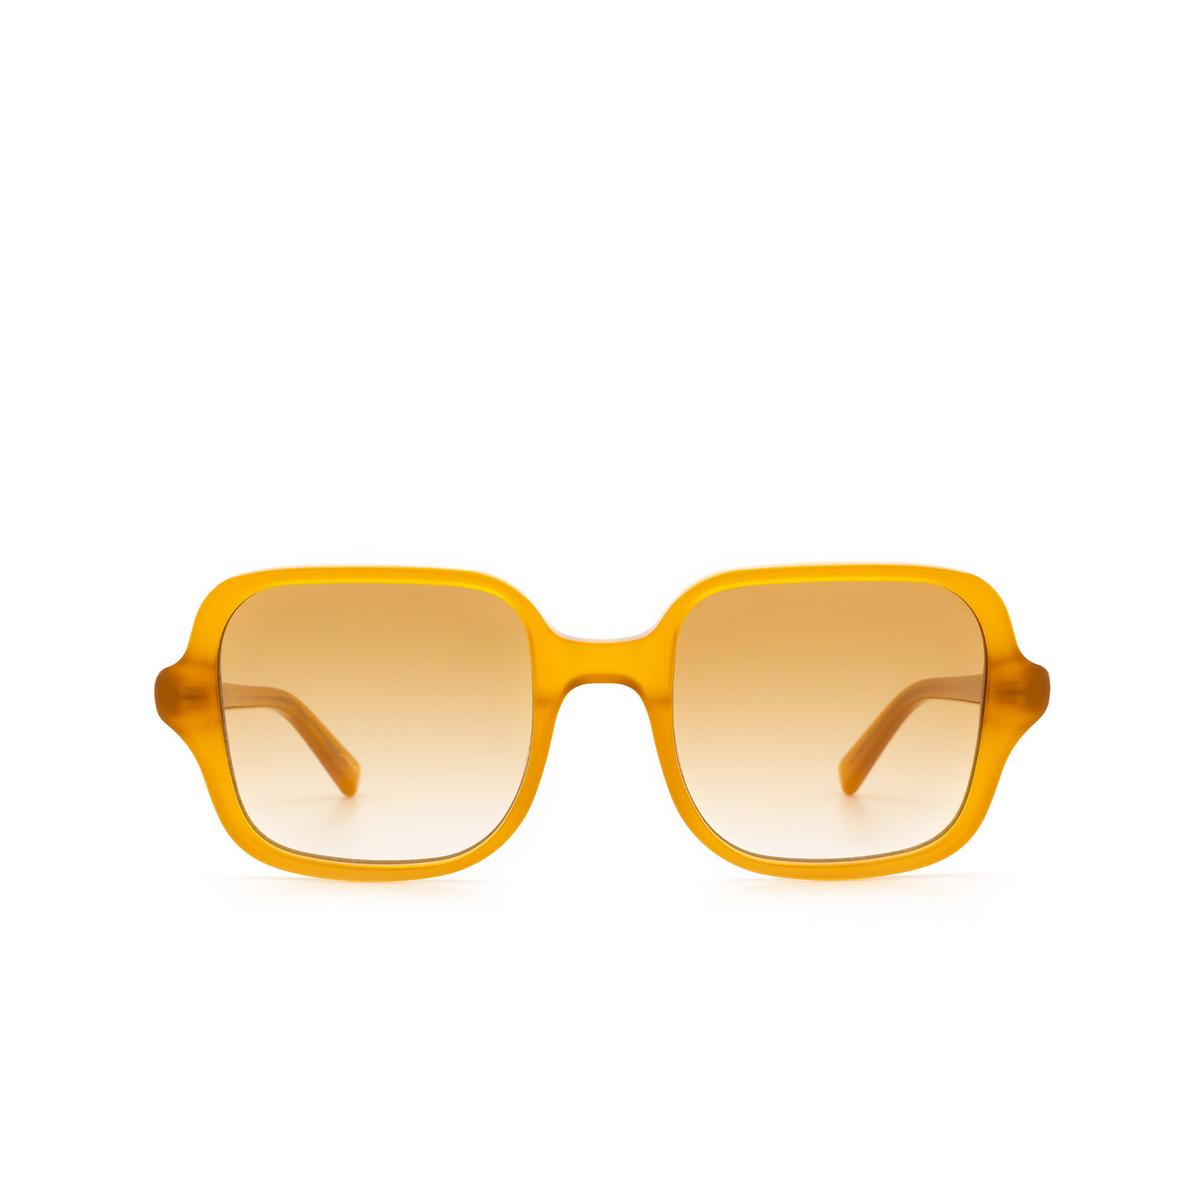 Chimi® Square Sunglasses: Voyage Square color Honey - front view.